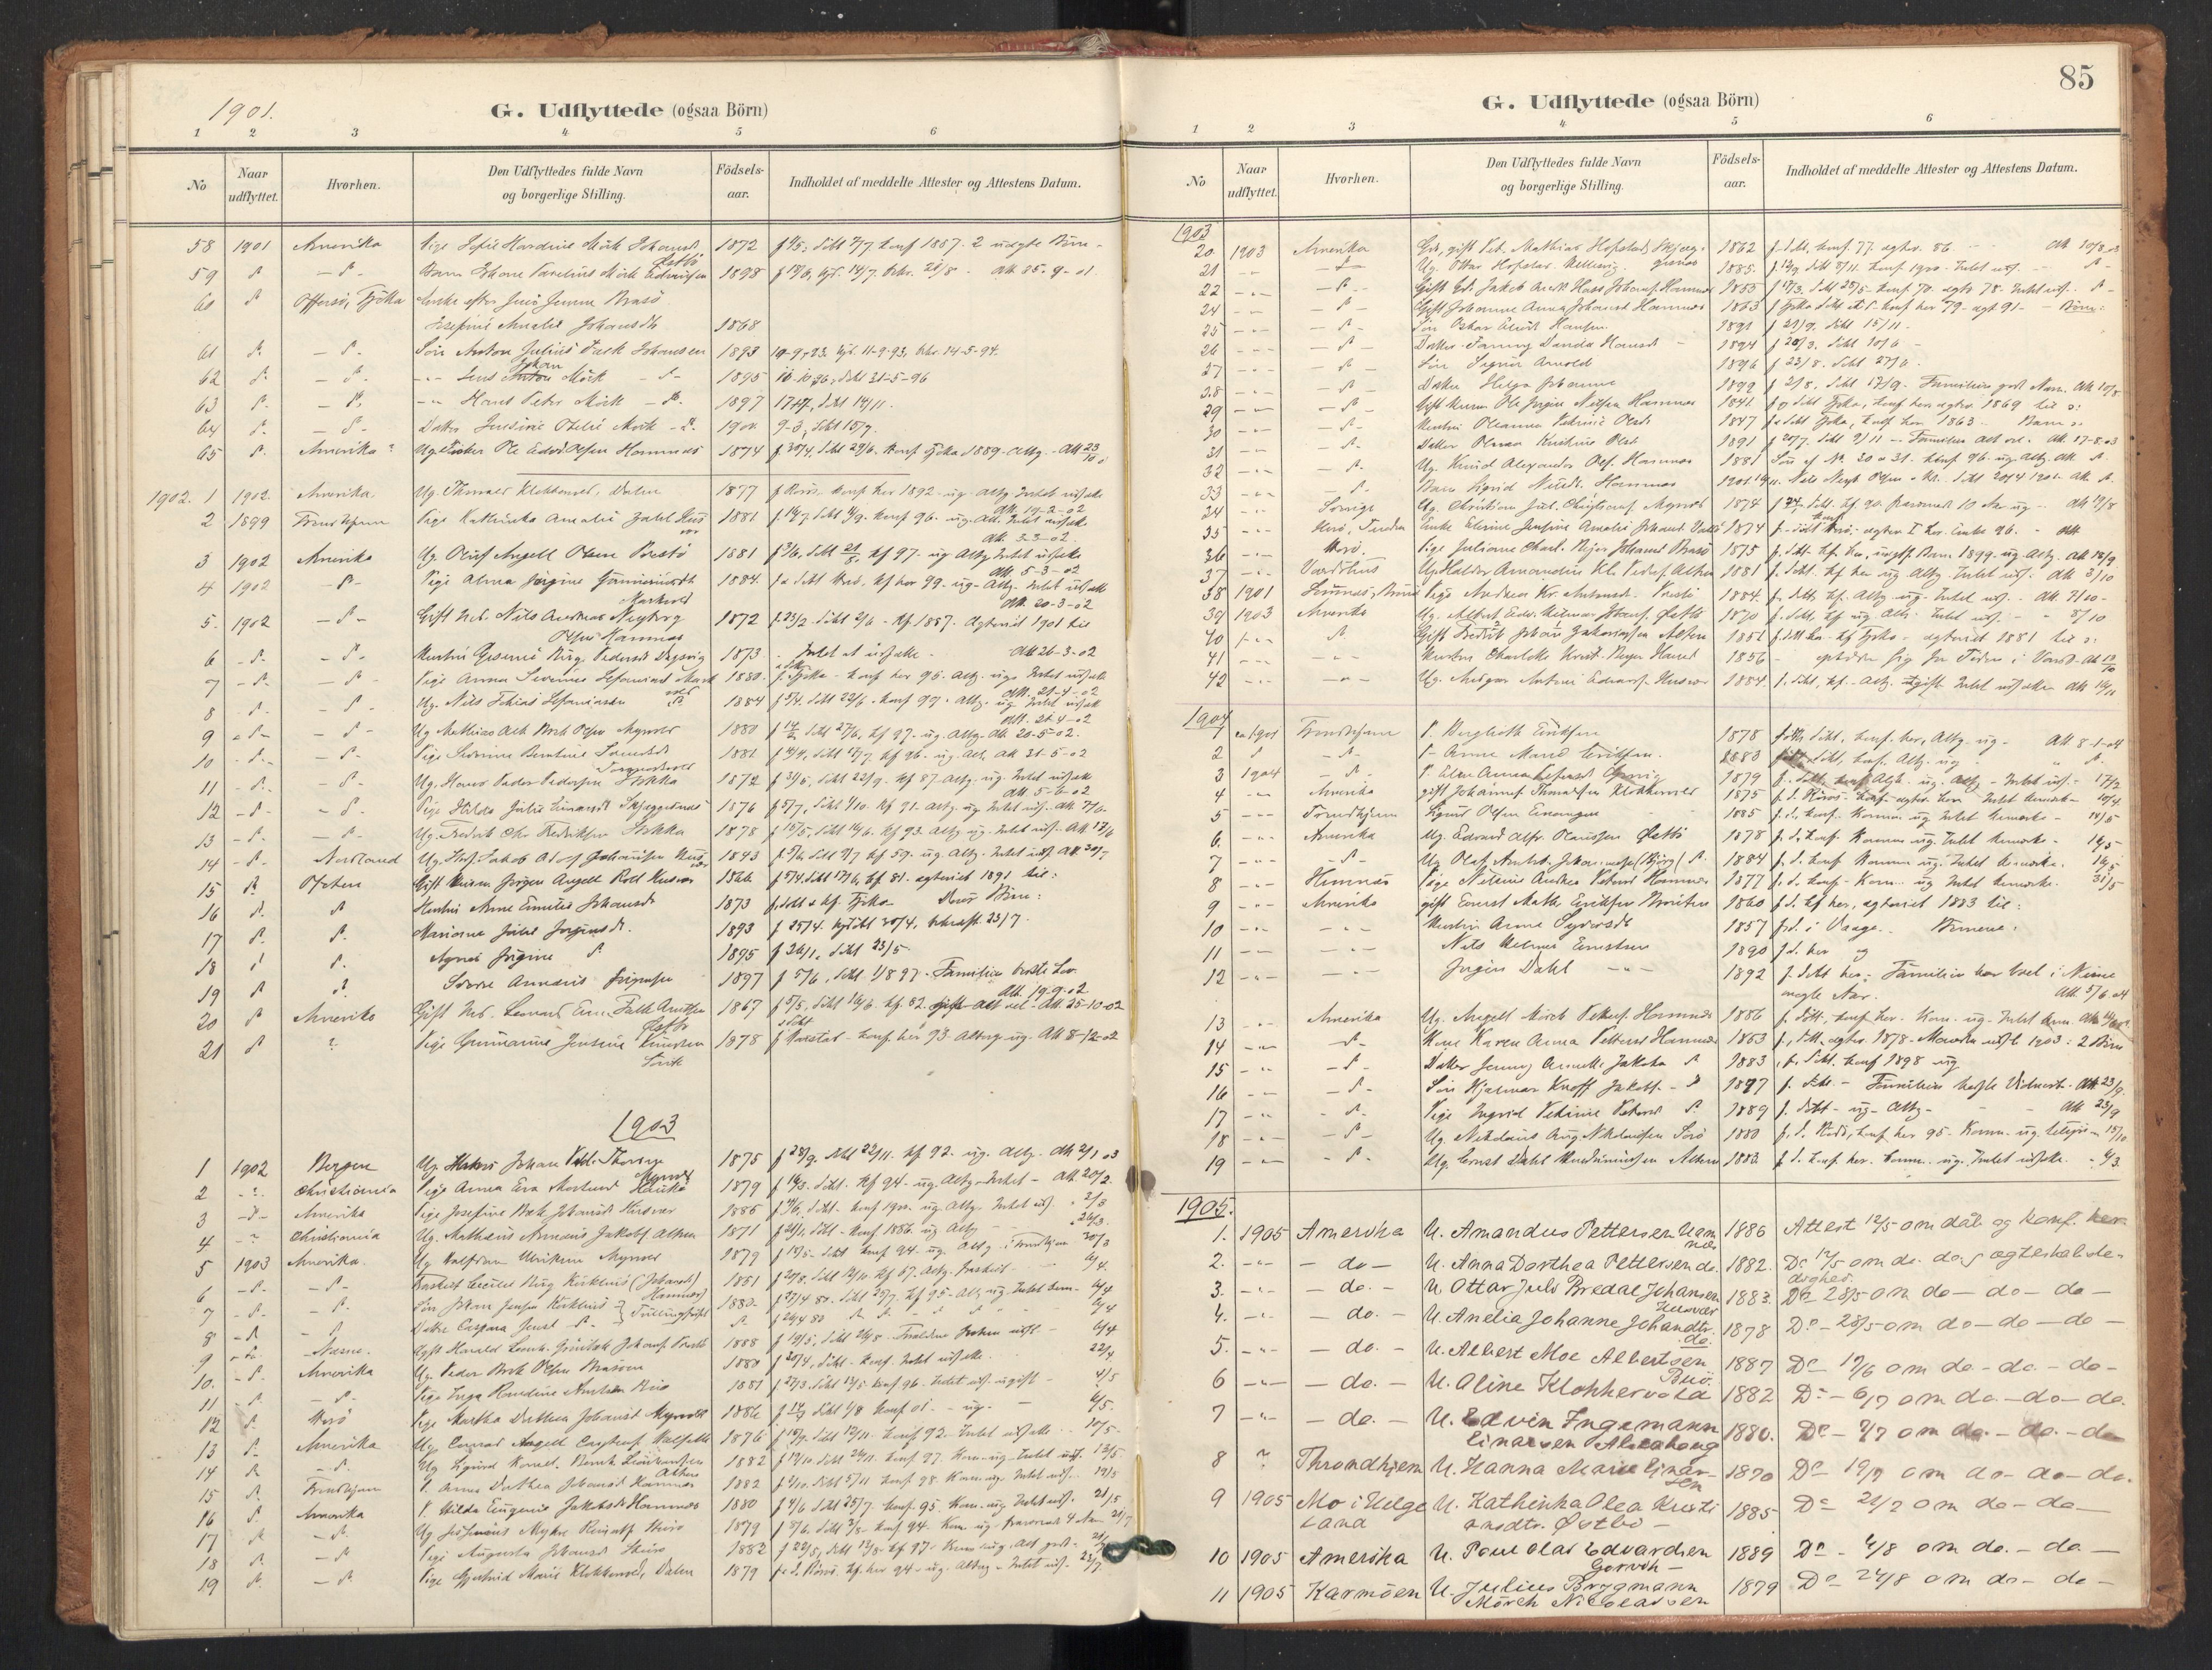 SAT, Ministerialprotokoller, klokkerbøker og fødselsregistre - Nordland, 830/L0454: Ministerialbok nr. 830A18, 1897-1913, s. 85